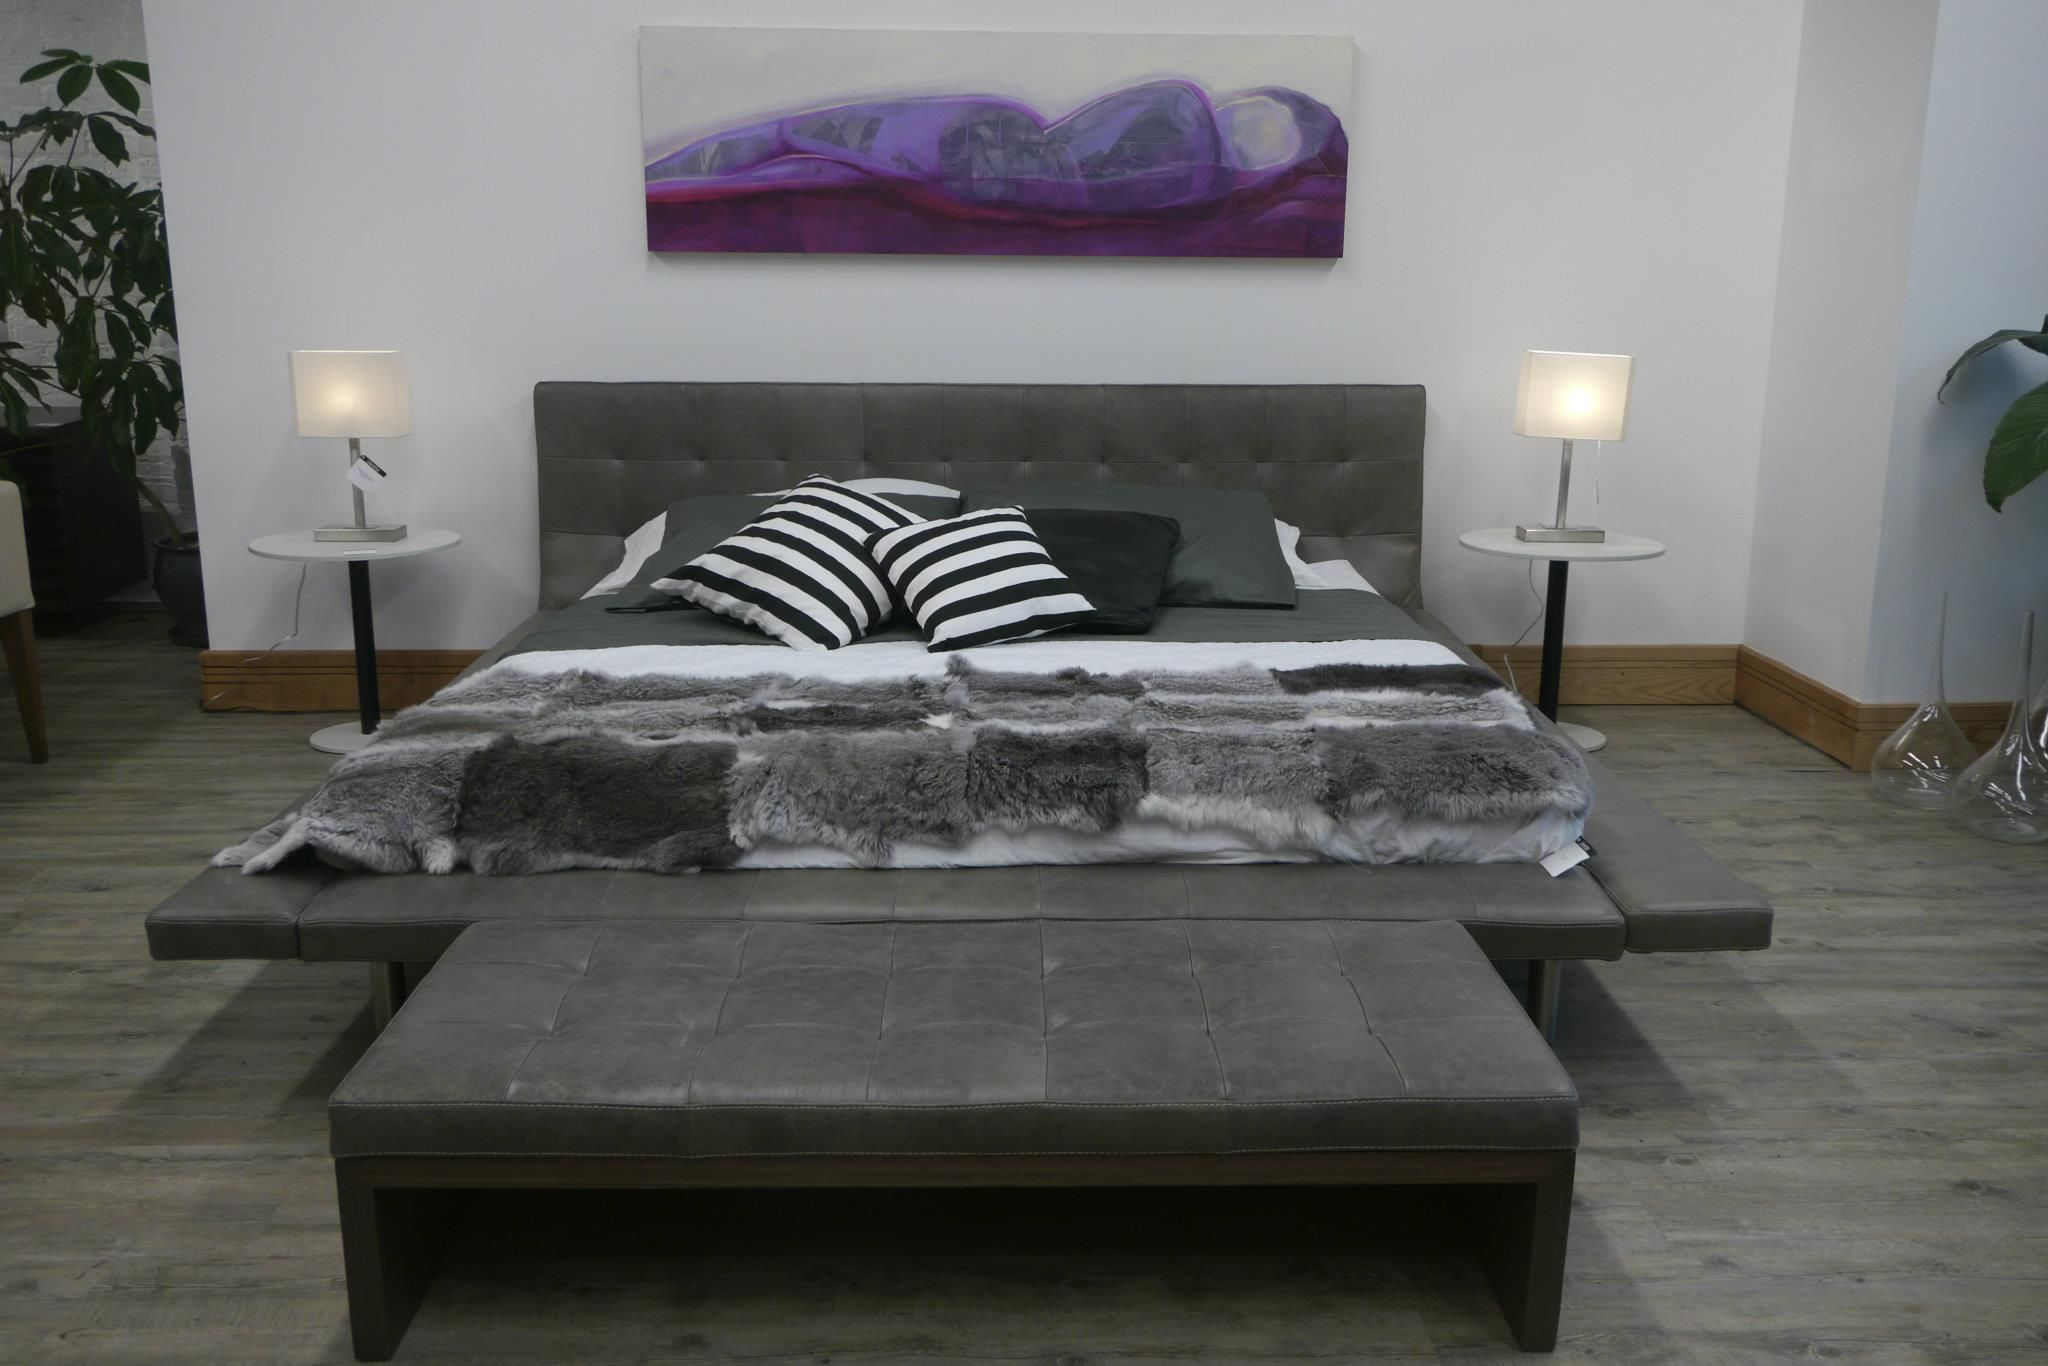 Zientte Muebles Contemporaneos Camas Bed Room Pinterest # Muebles Zientte